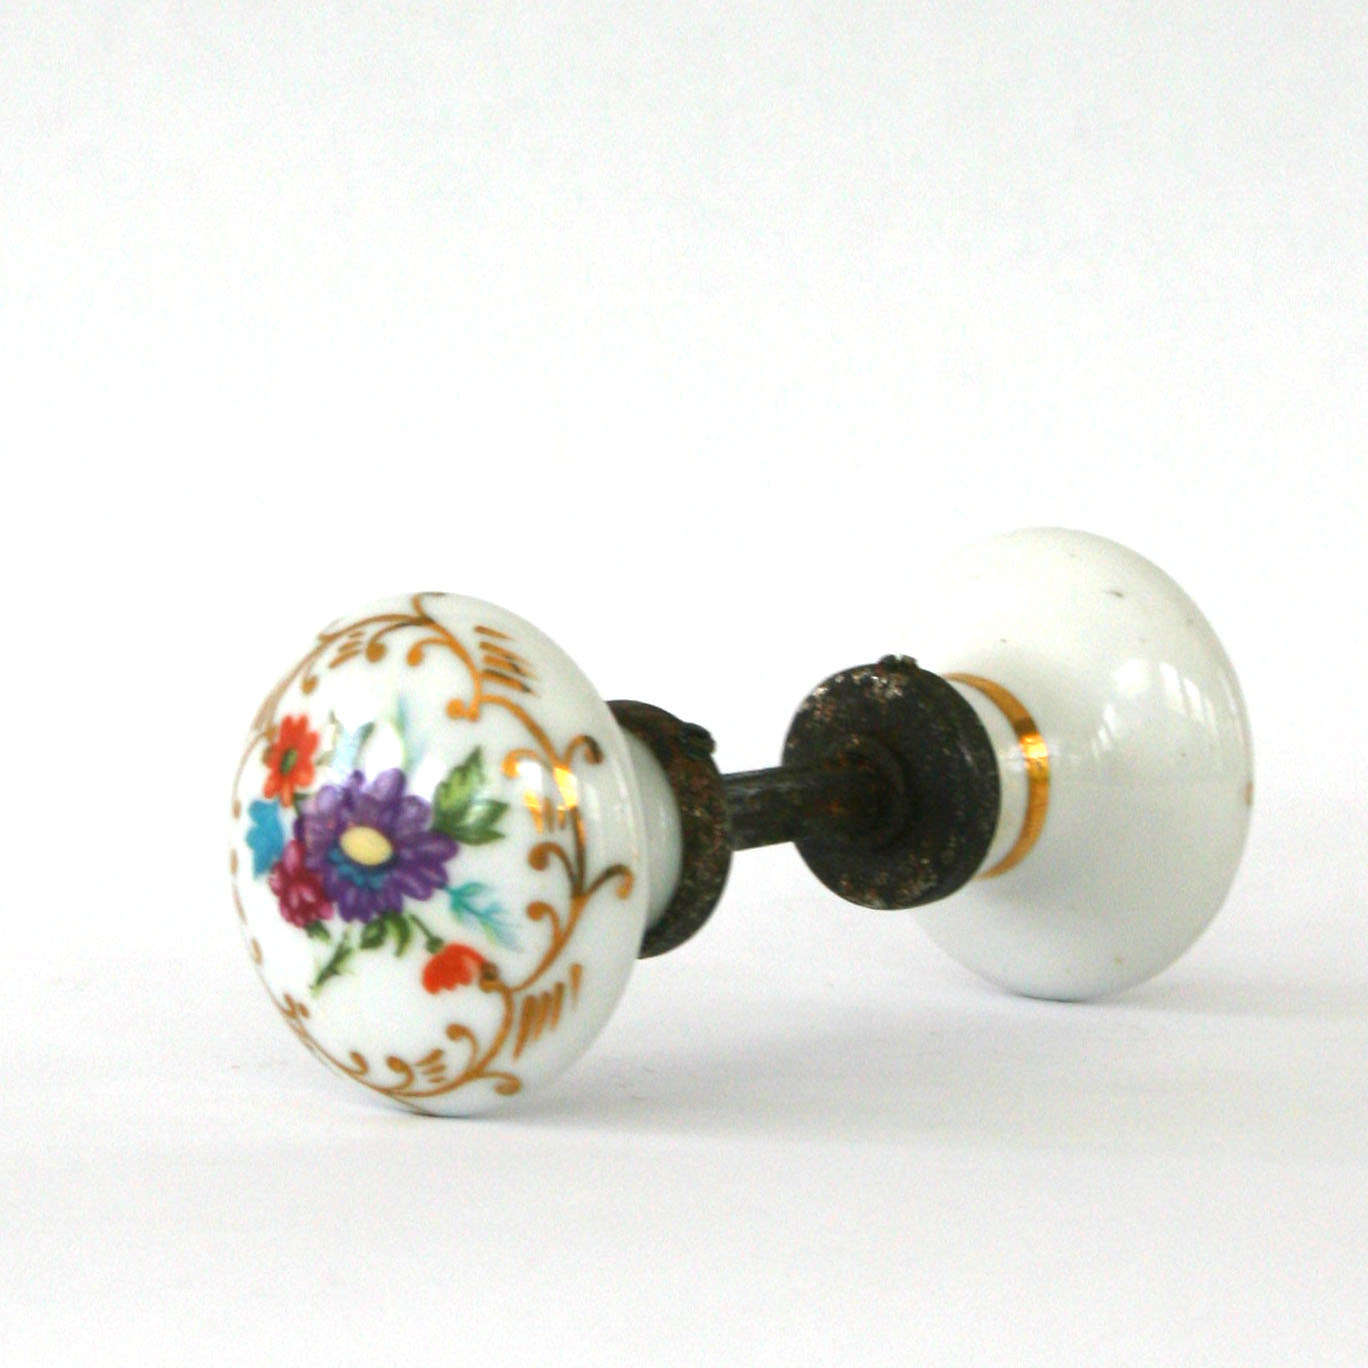 vintage porcelain door knobs photo - 9